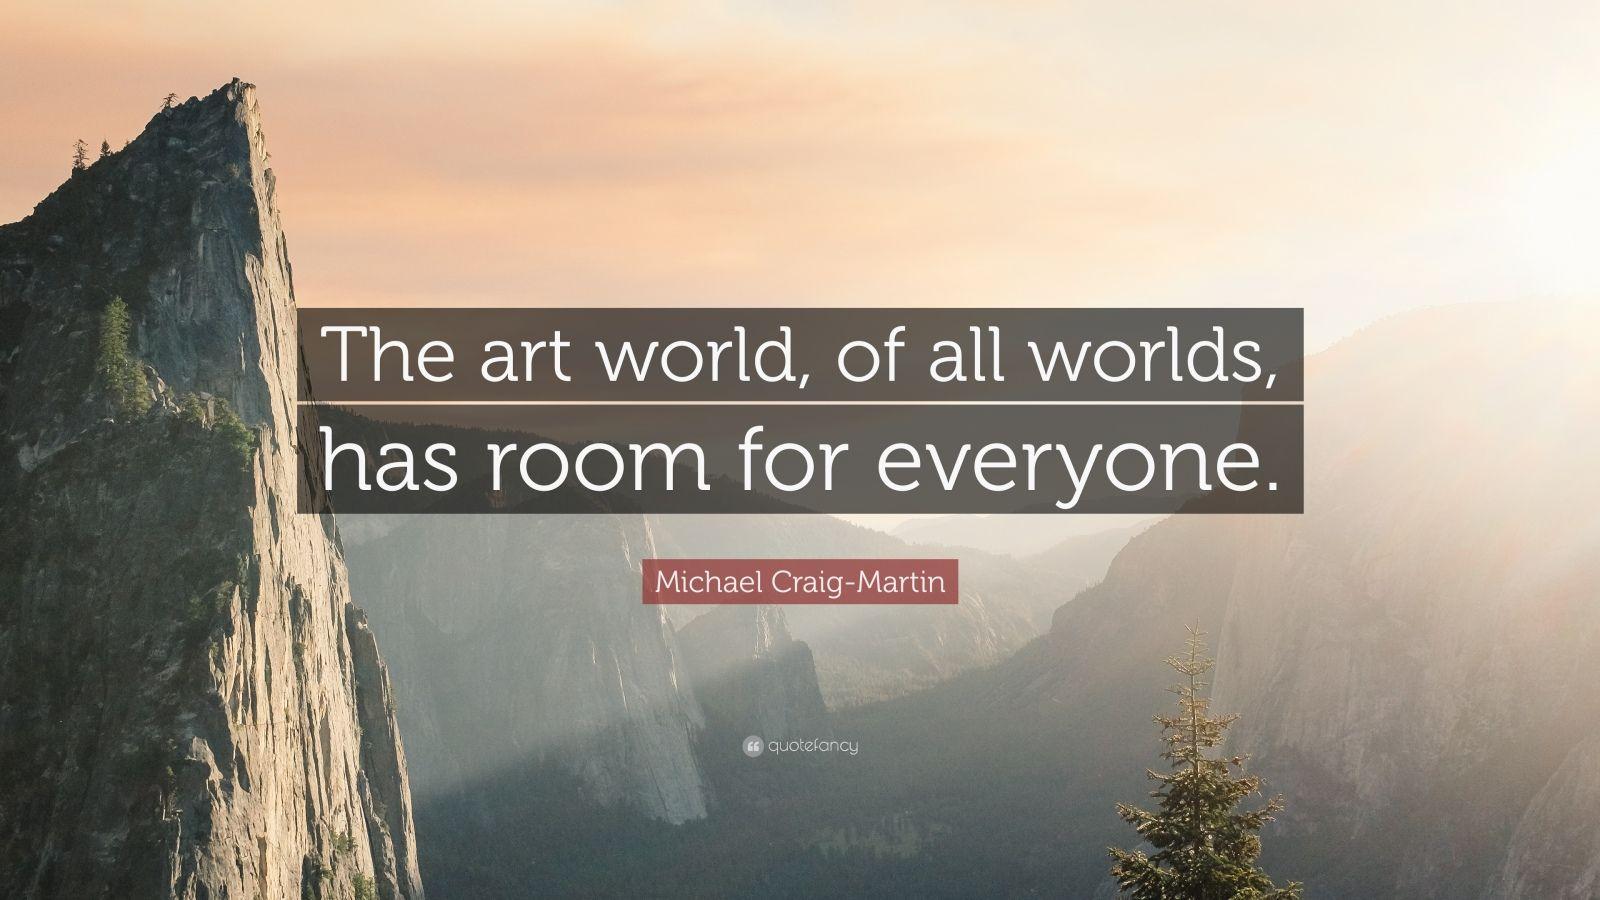 Steve Jobs Motivational Quotes Wallpaper Michael Craig Martin Quotes 10 Wallpapers Quotefancy